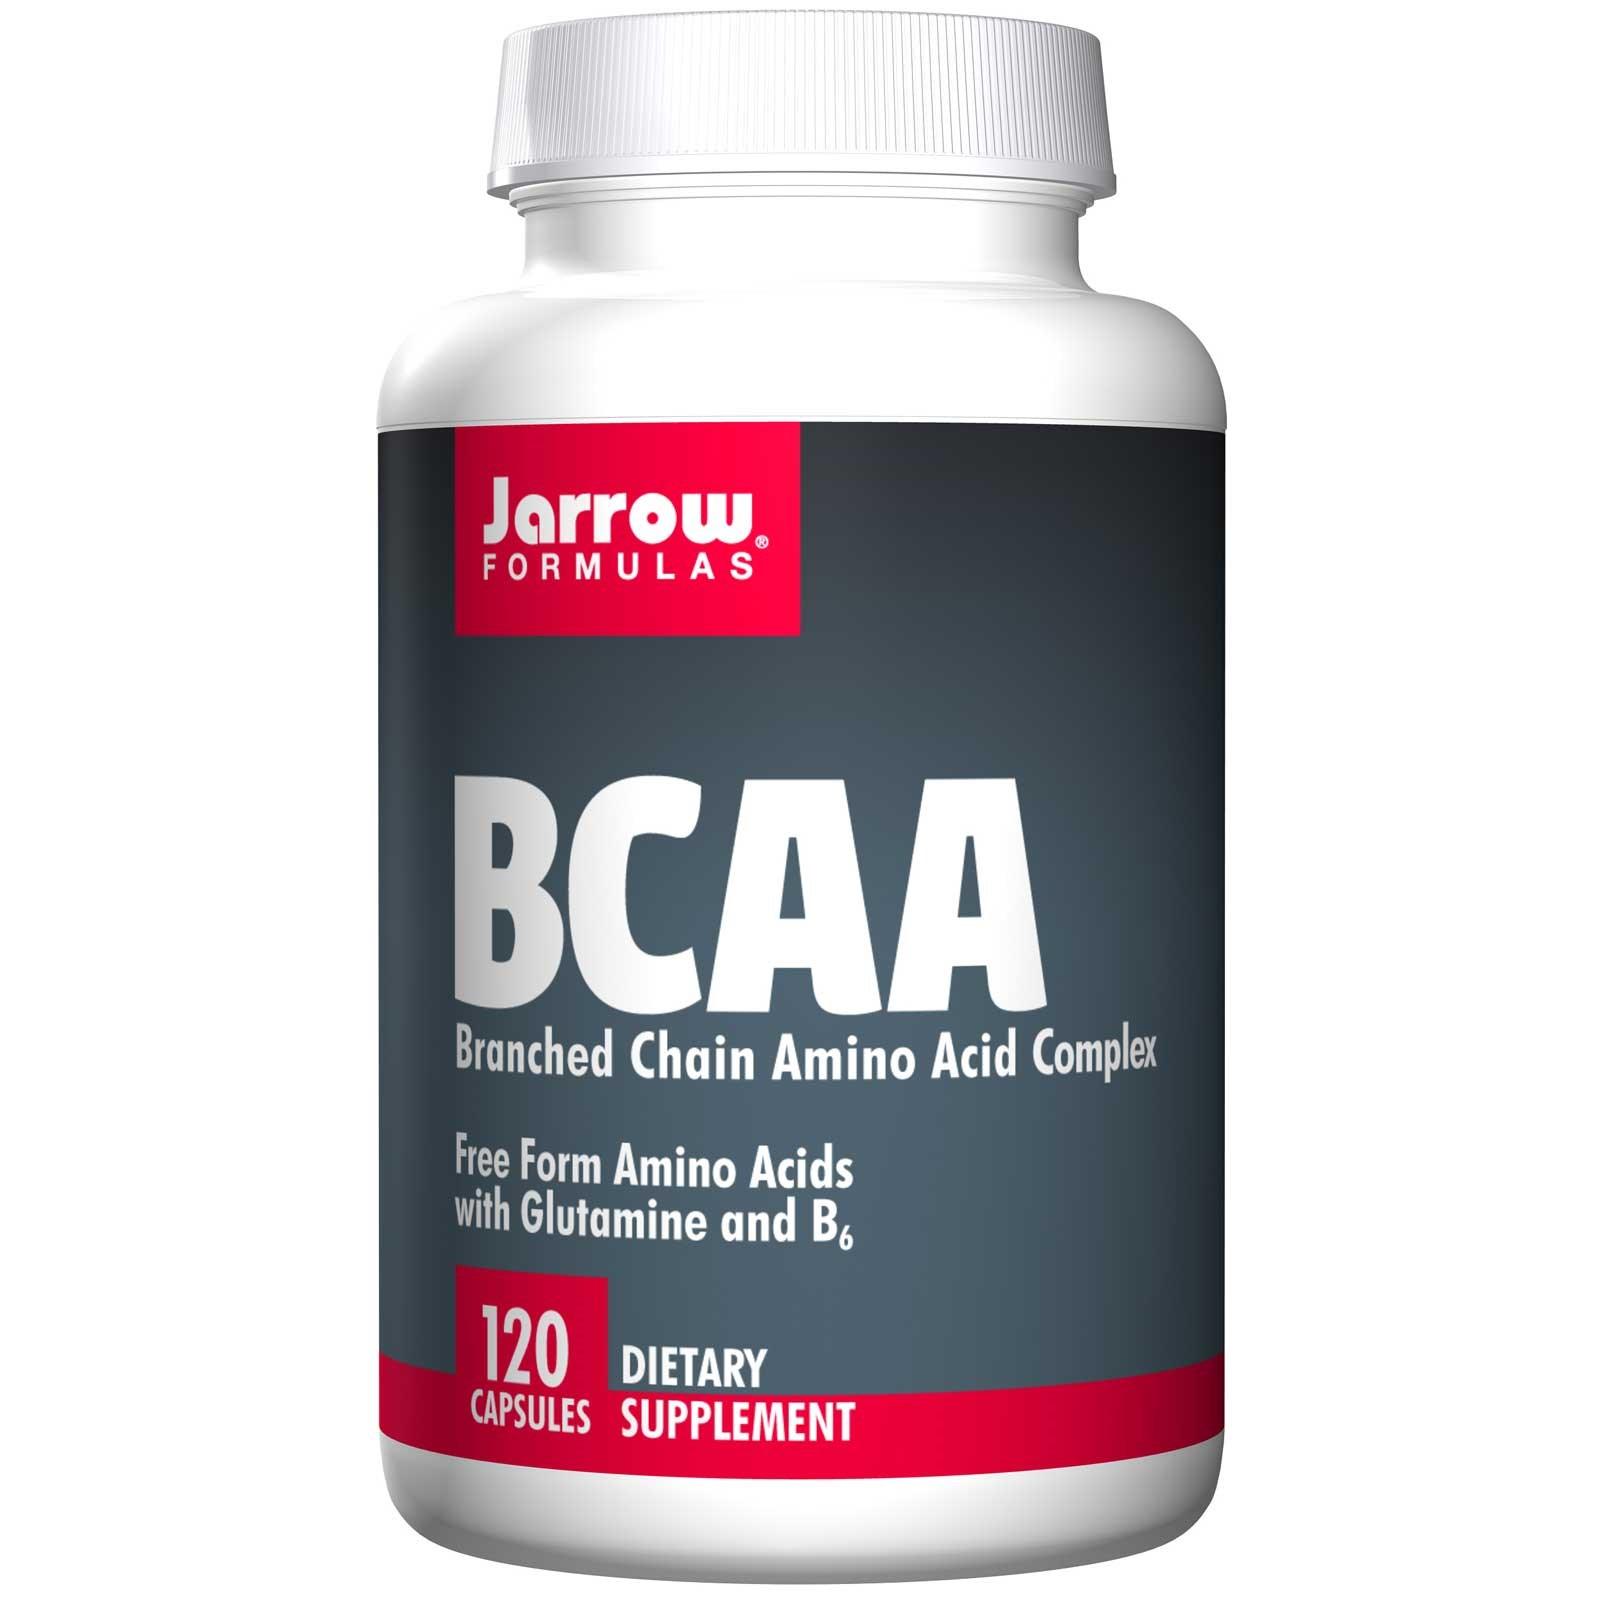 BCAA, Branched Chain Amino Acid Complex (120 Capsules) Jarrow Formulas